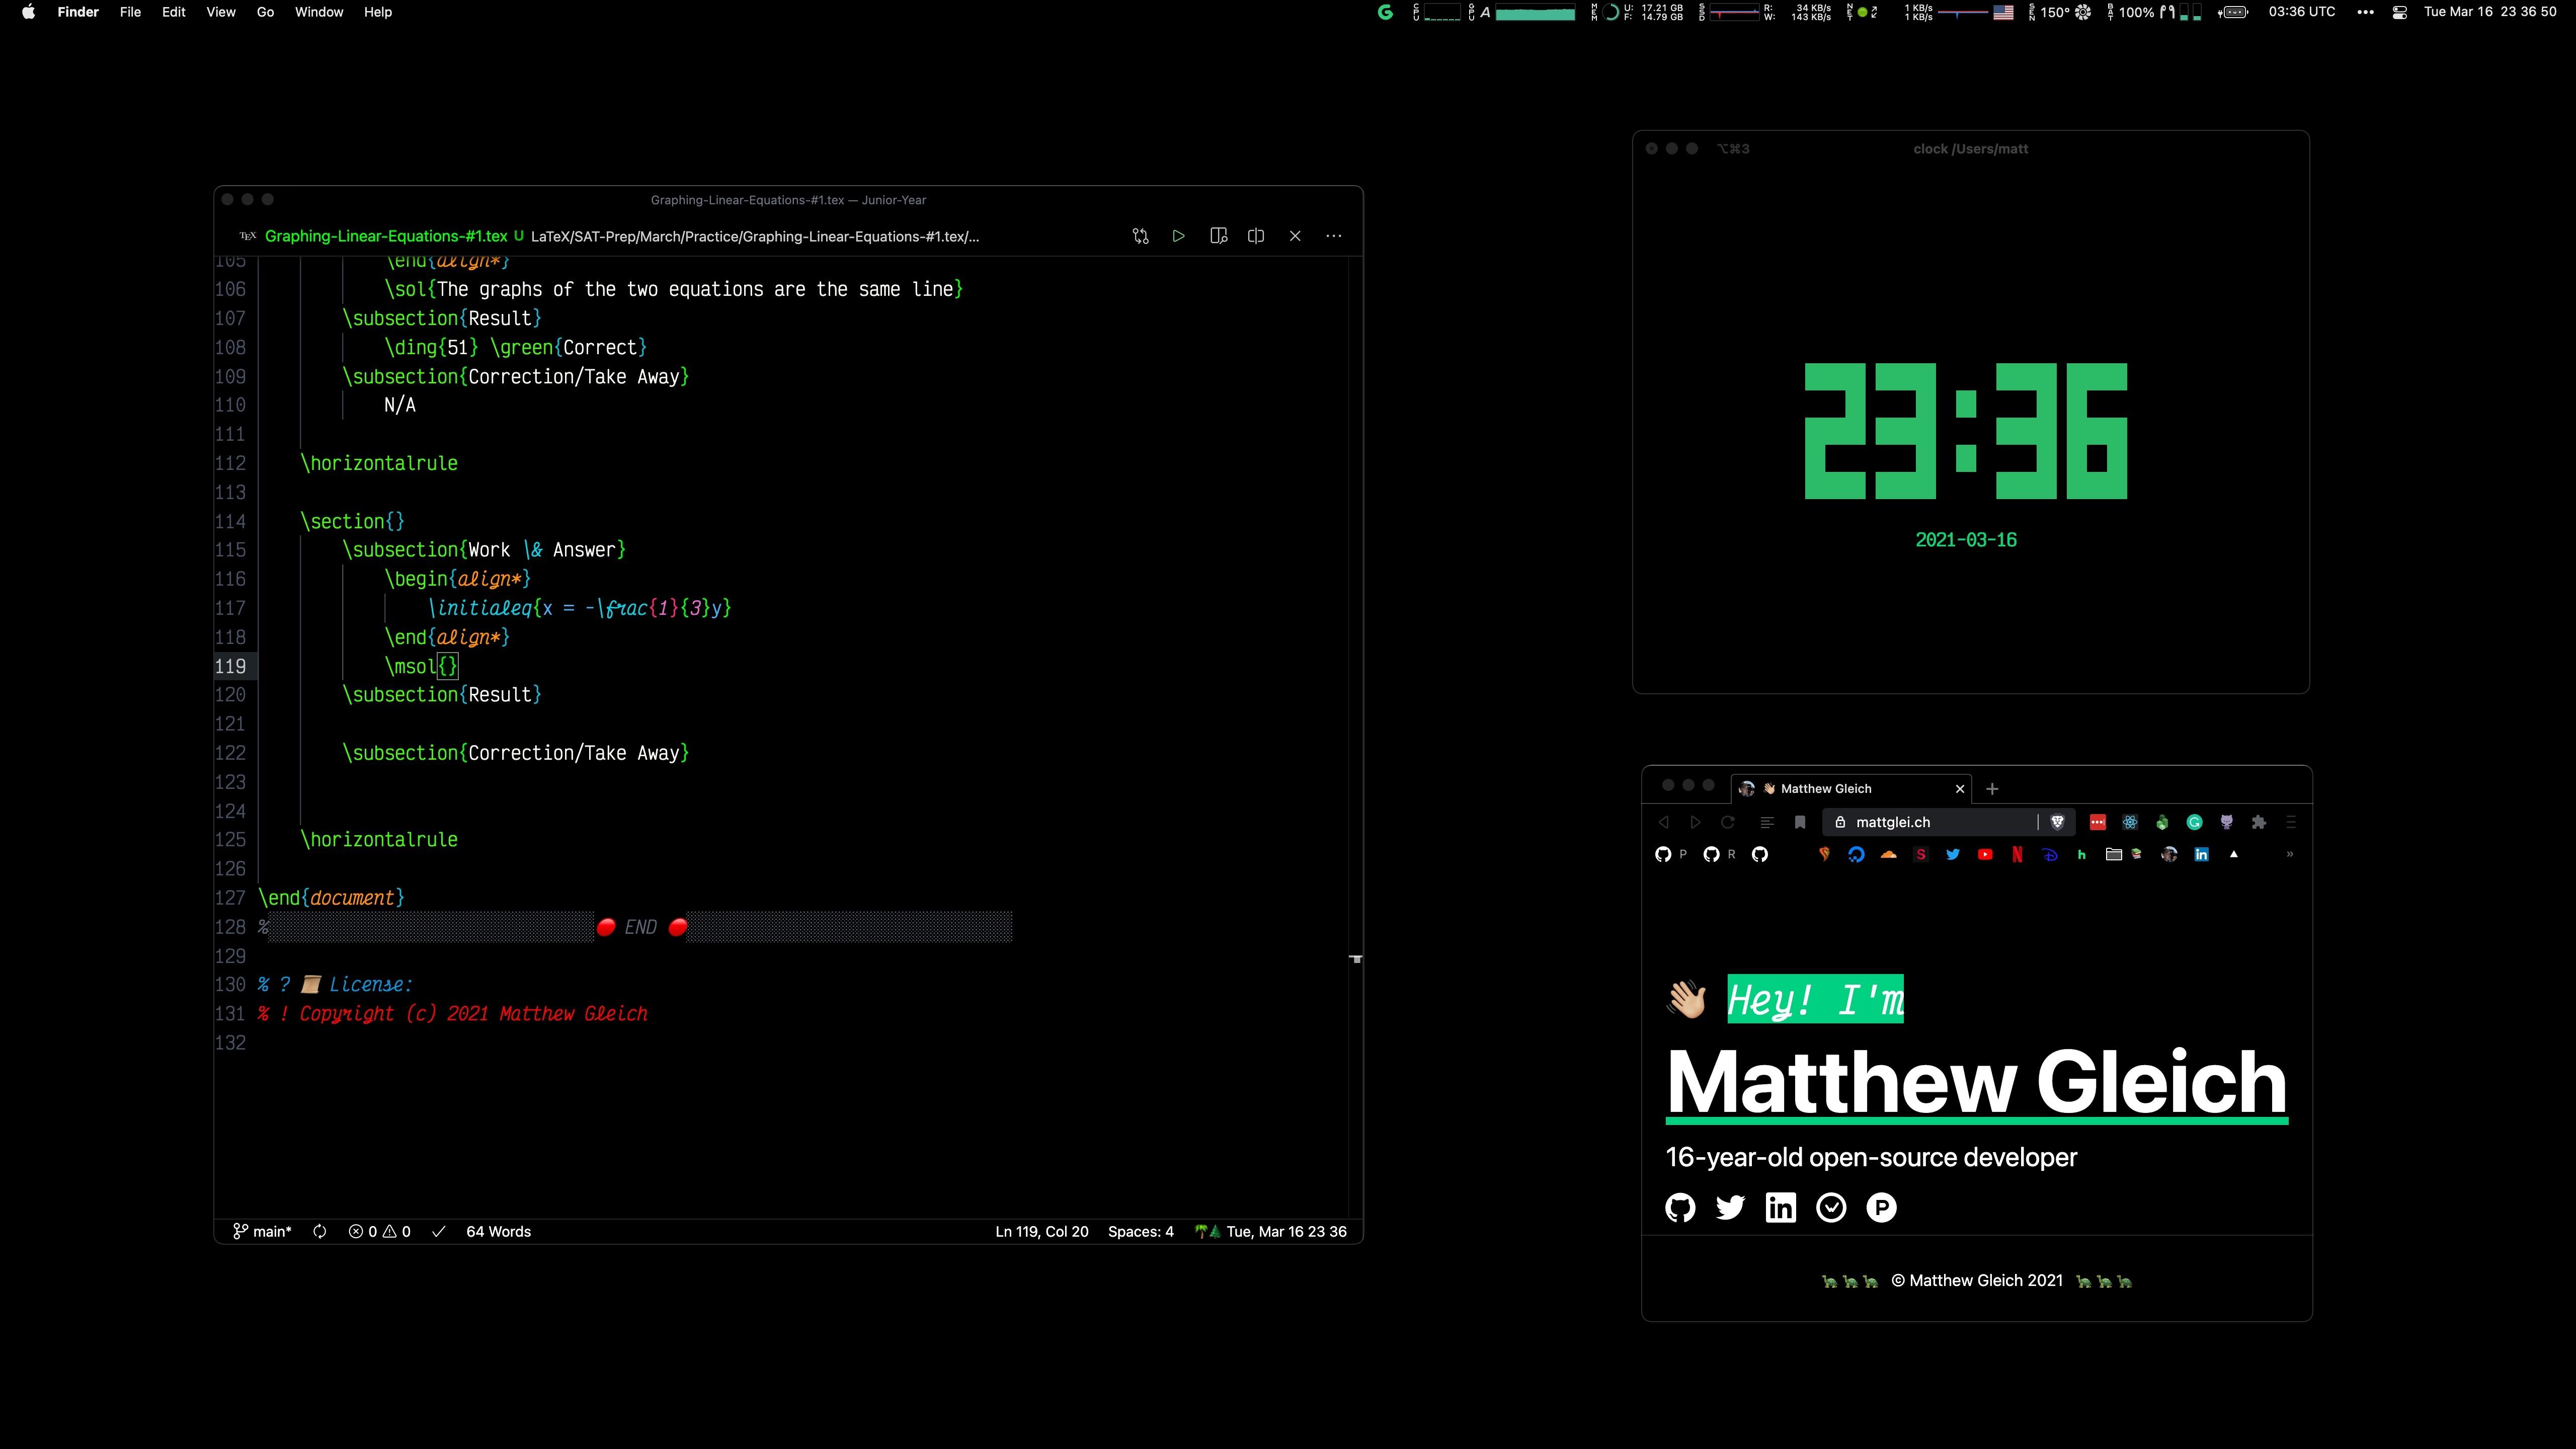 https://cloud-ngb89kuo0-hack-club-bot.vercel.app/0screen_shot_2021-03-16_at_23.36.50.jpg